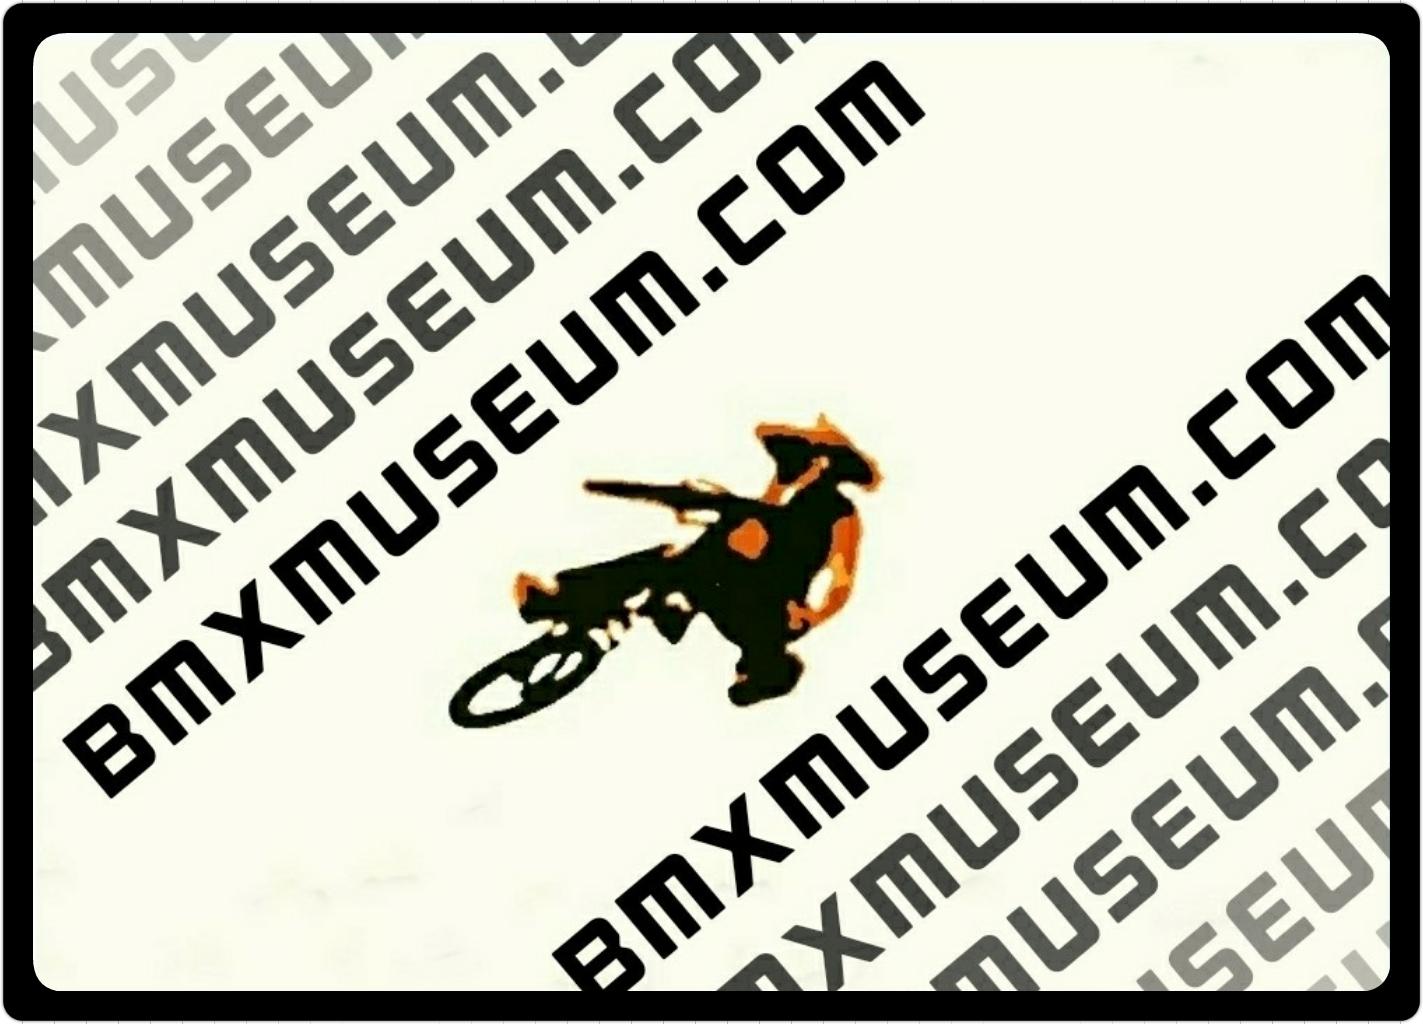 https://s3.amazonaws.com/uploads.bmxmuseum.com/user-images/3032/photogrid_15667582209895d62d73a61.jpg